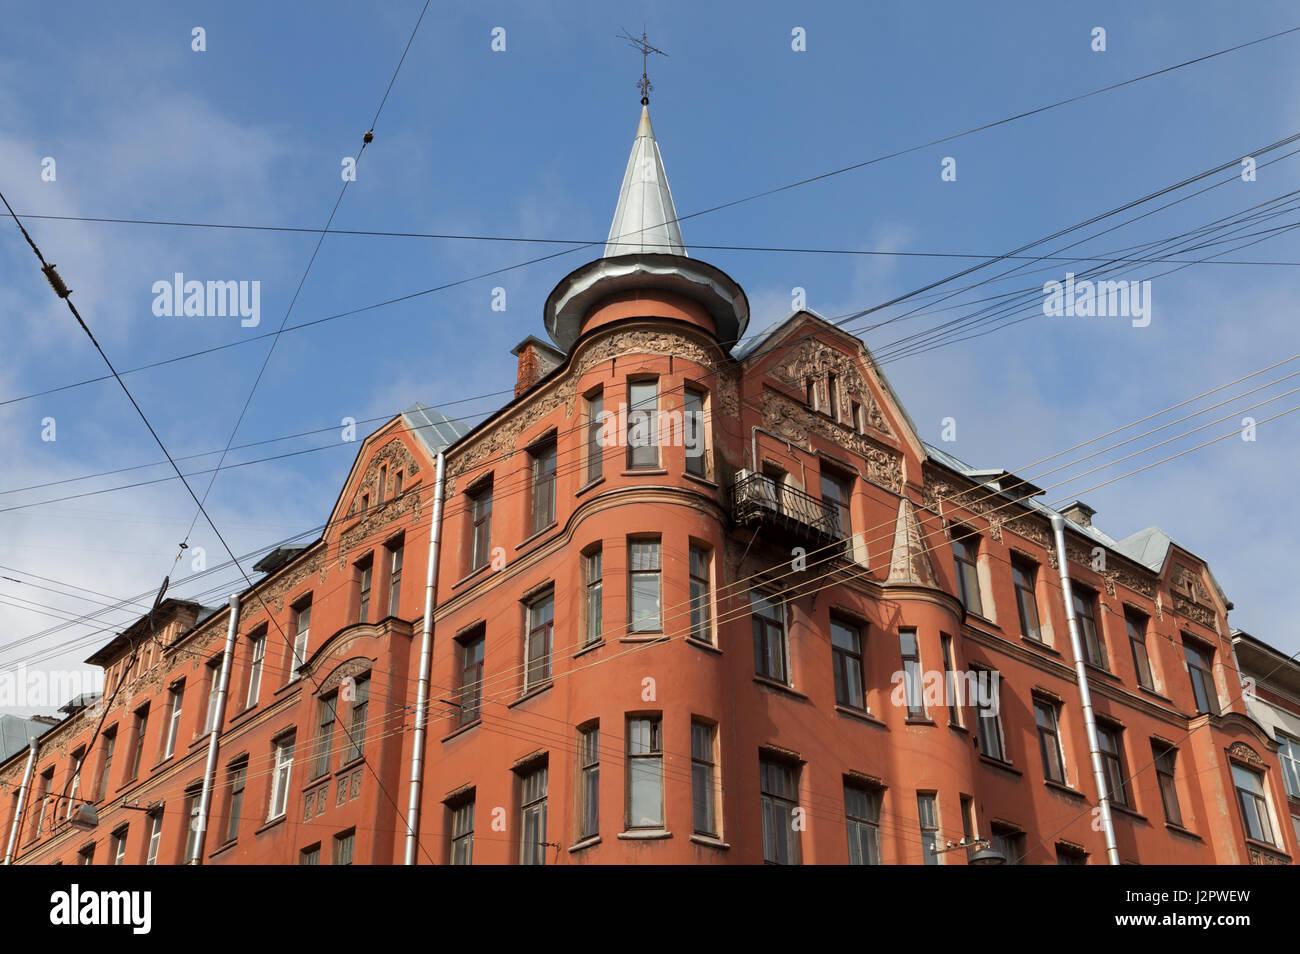 On the corner of Perekupnoy pereulok and Kherson Street, St. Petersburg, Russia. - Stock Image